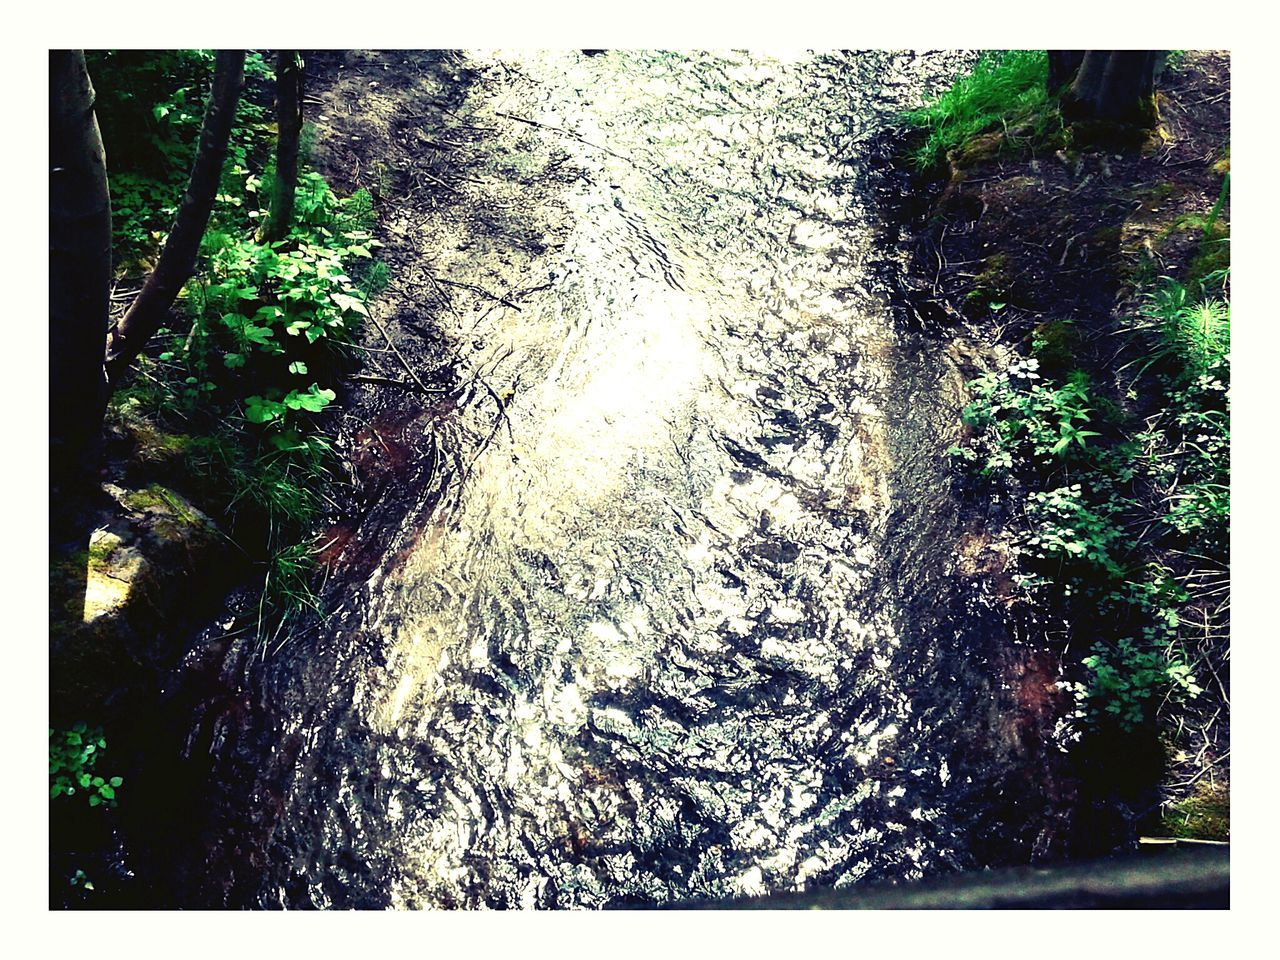 A stream at Dashpoint Statepark